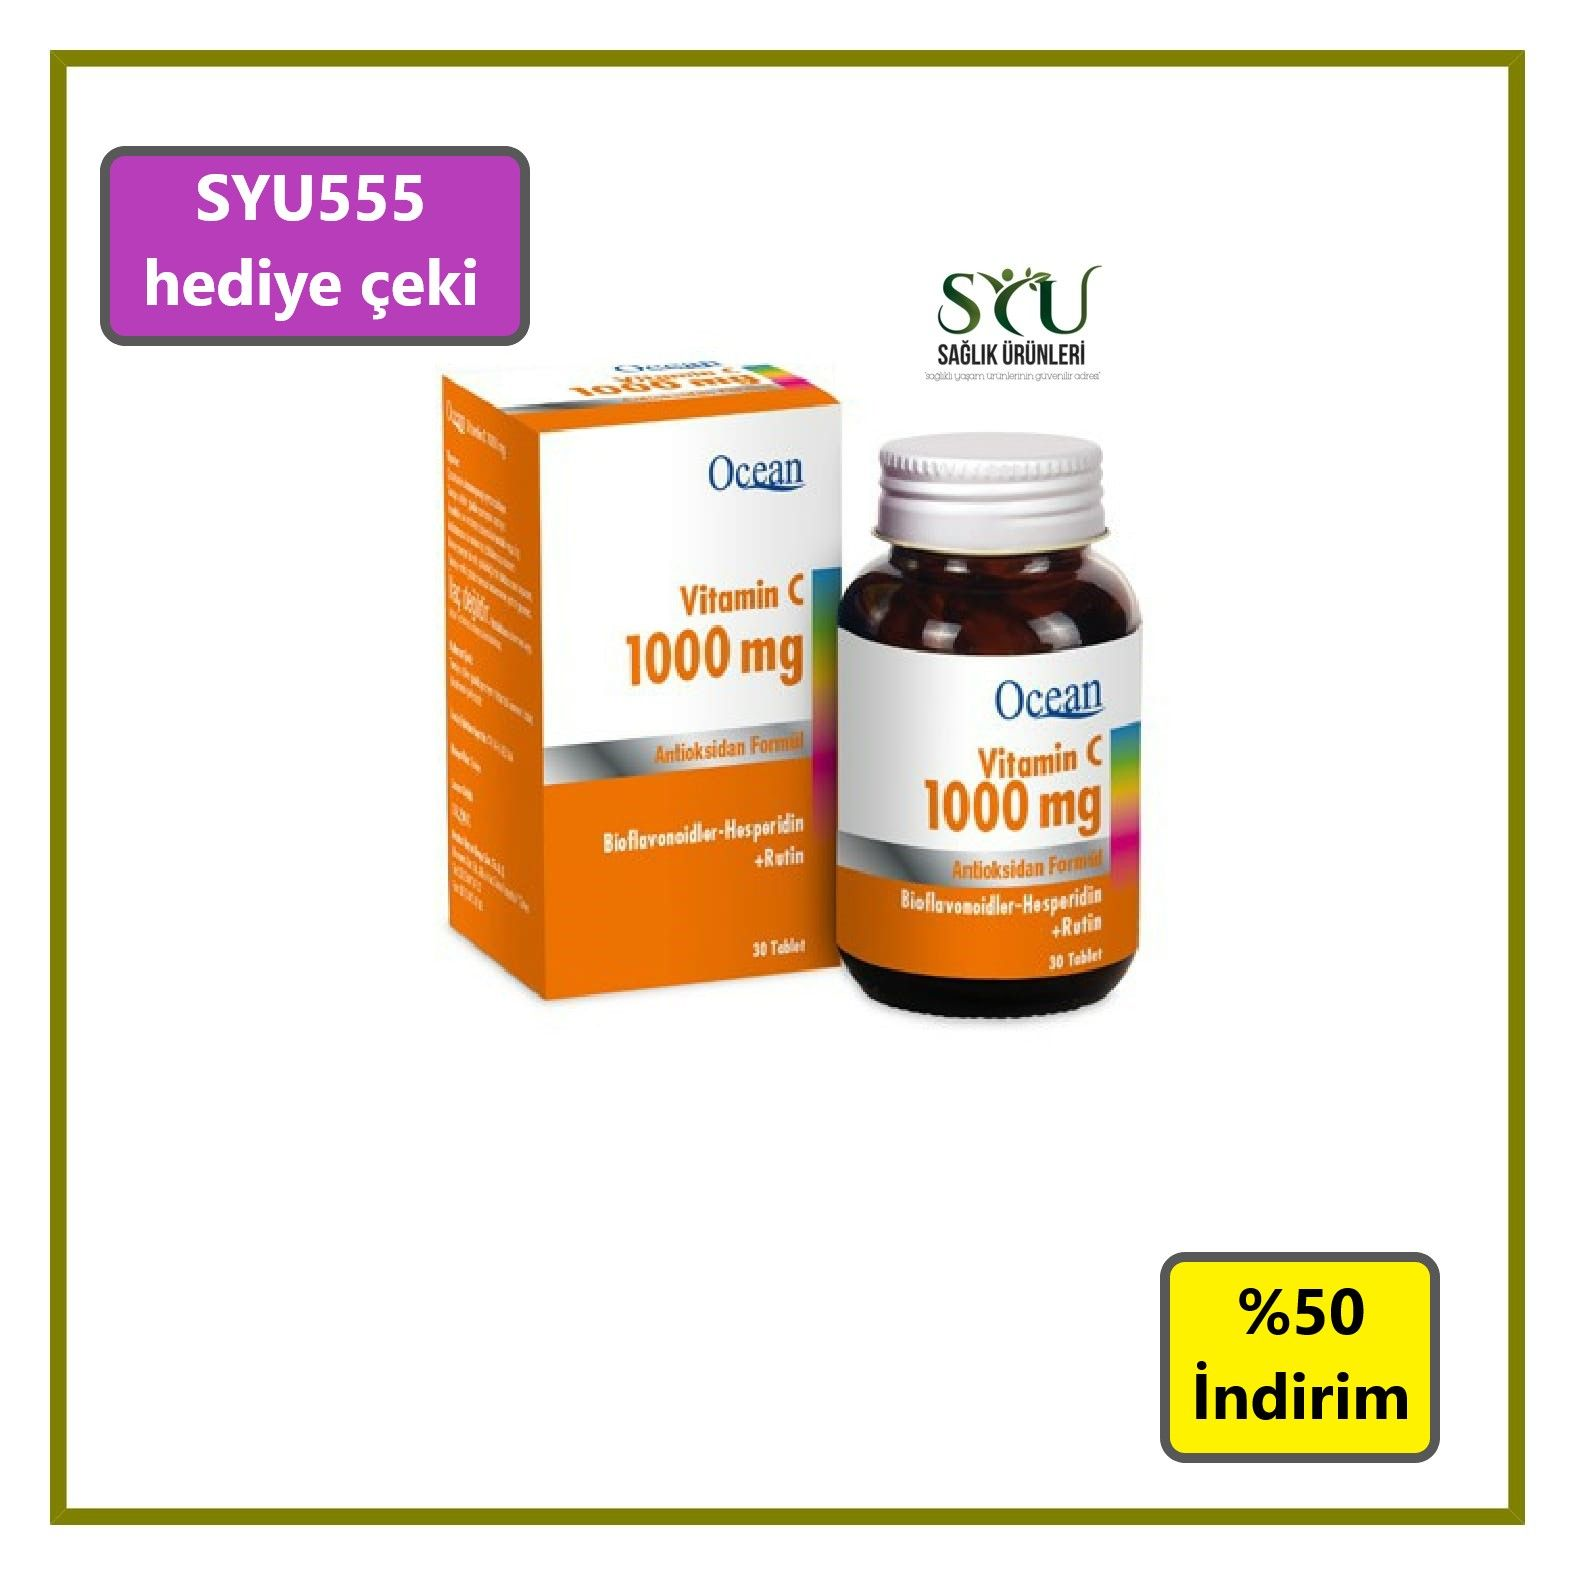 Ocean Vitamin C 1000 Mg 30 Tablet Fiyati 49 50 Tl Saglikli Yasam Urunleri Guvenilir Adresi Syu Com Tr Vitamin Vitaminler Saglikli Yasam